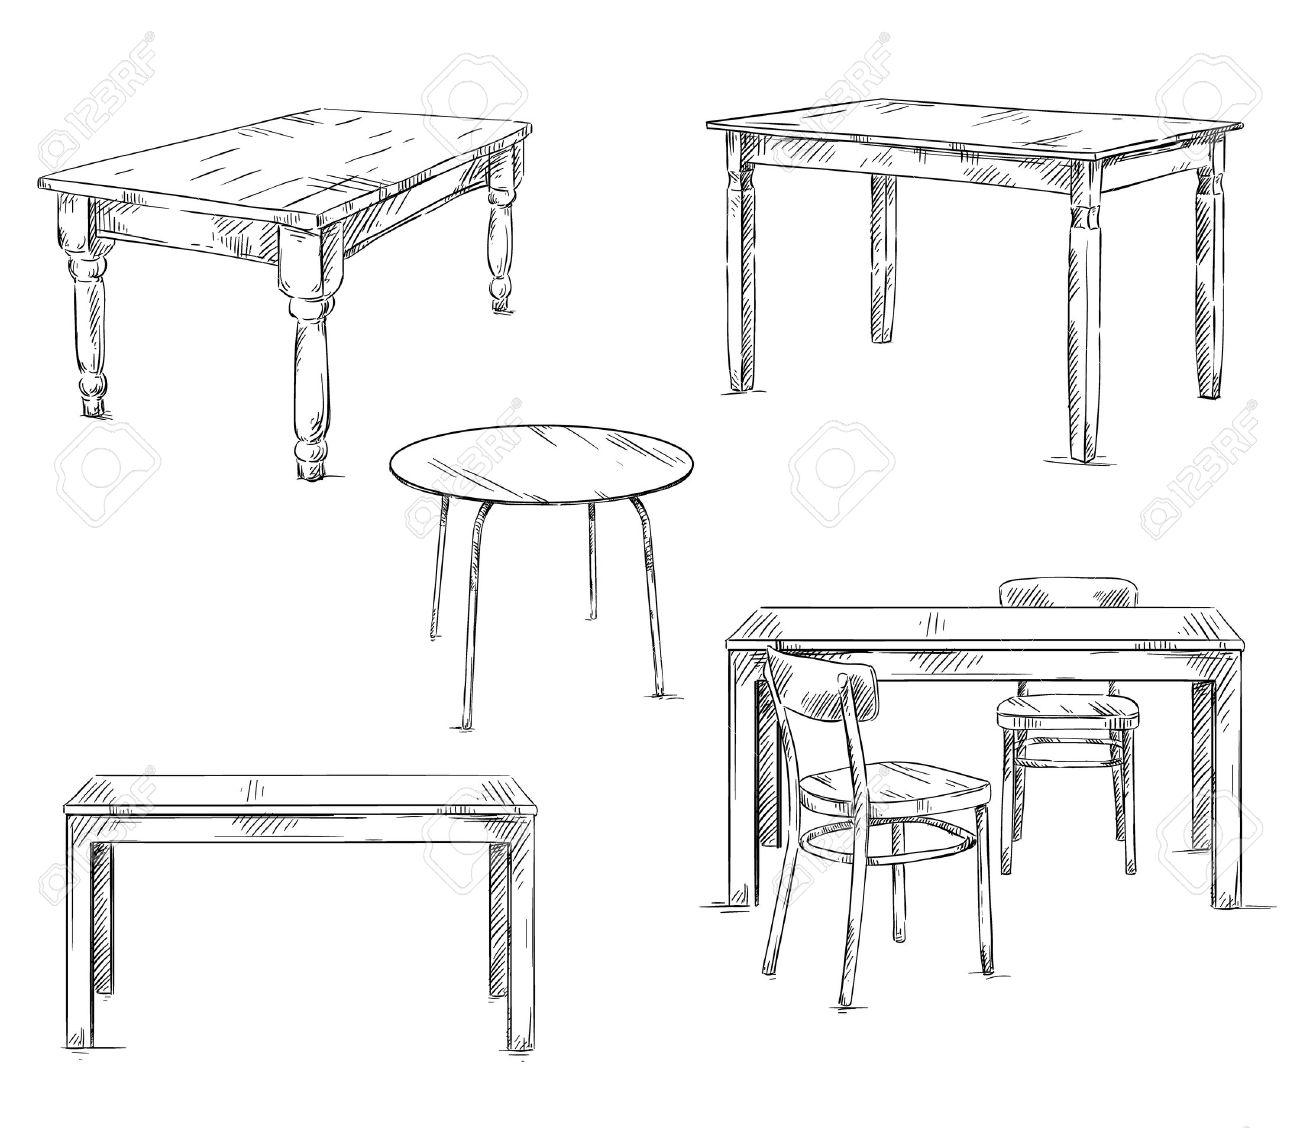 Tisch gezeichnet  Kamenuka #1 Foto Royalty Free, Immagini, Immagini E Archivi ...